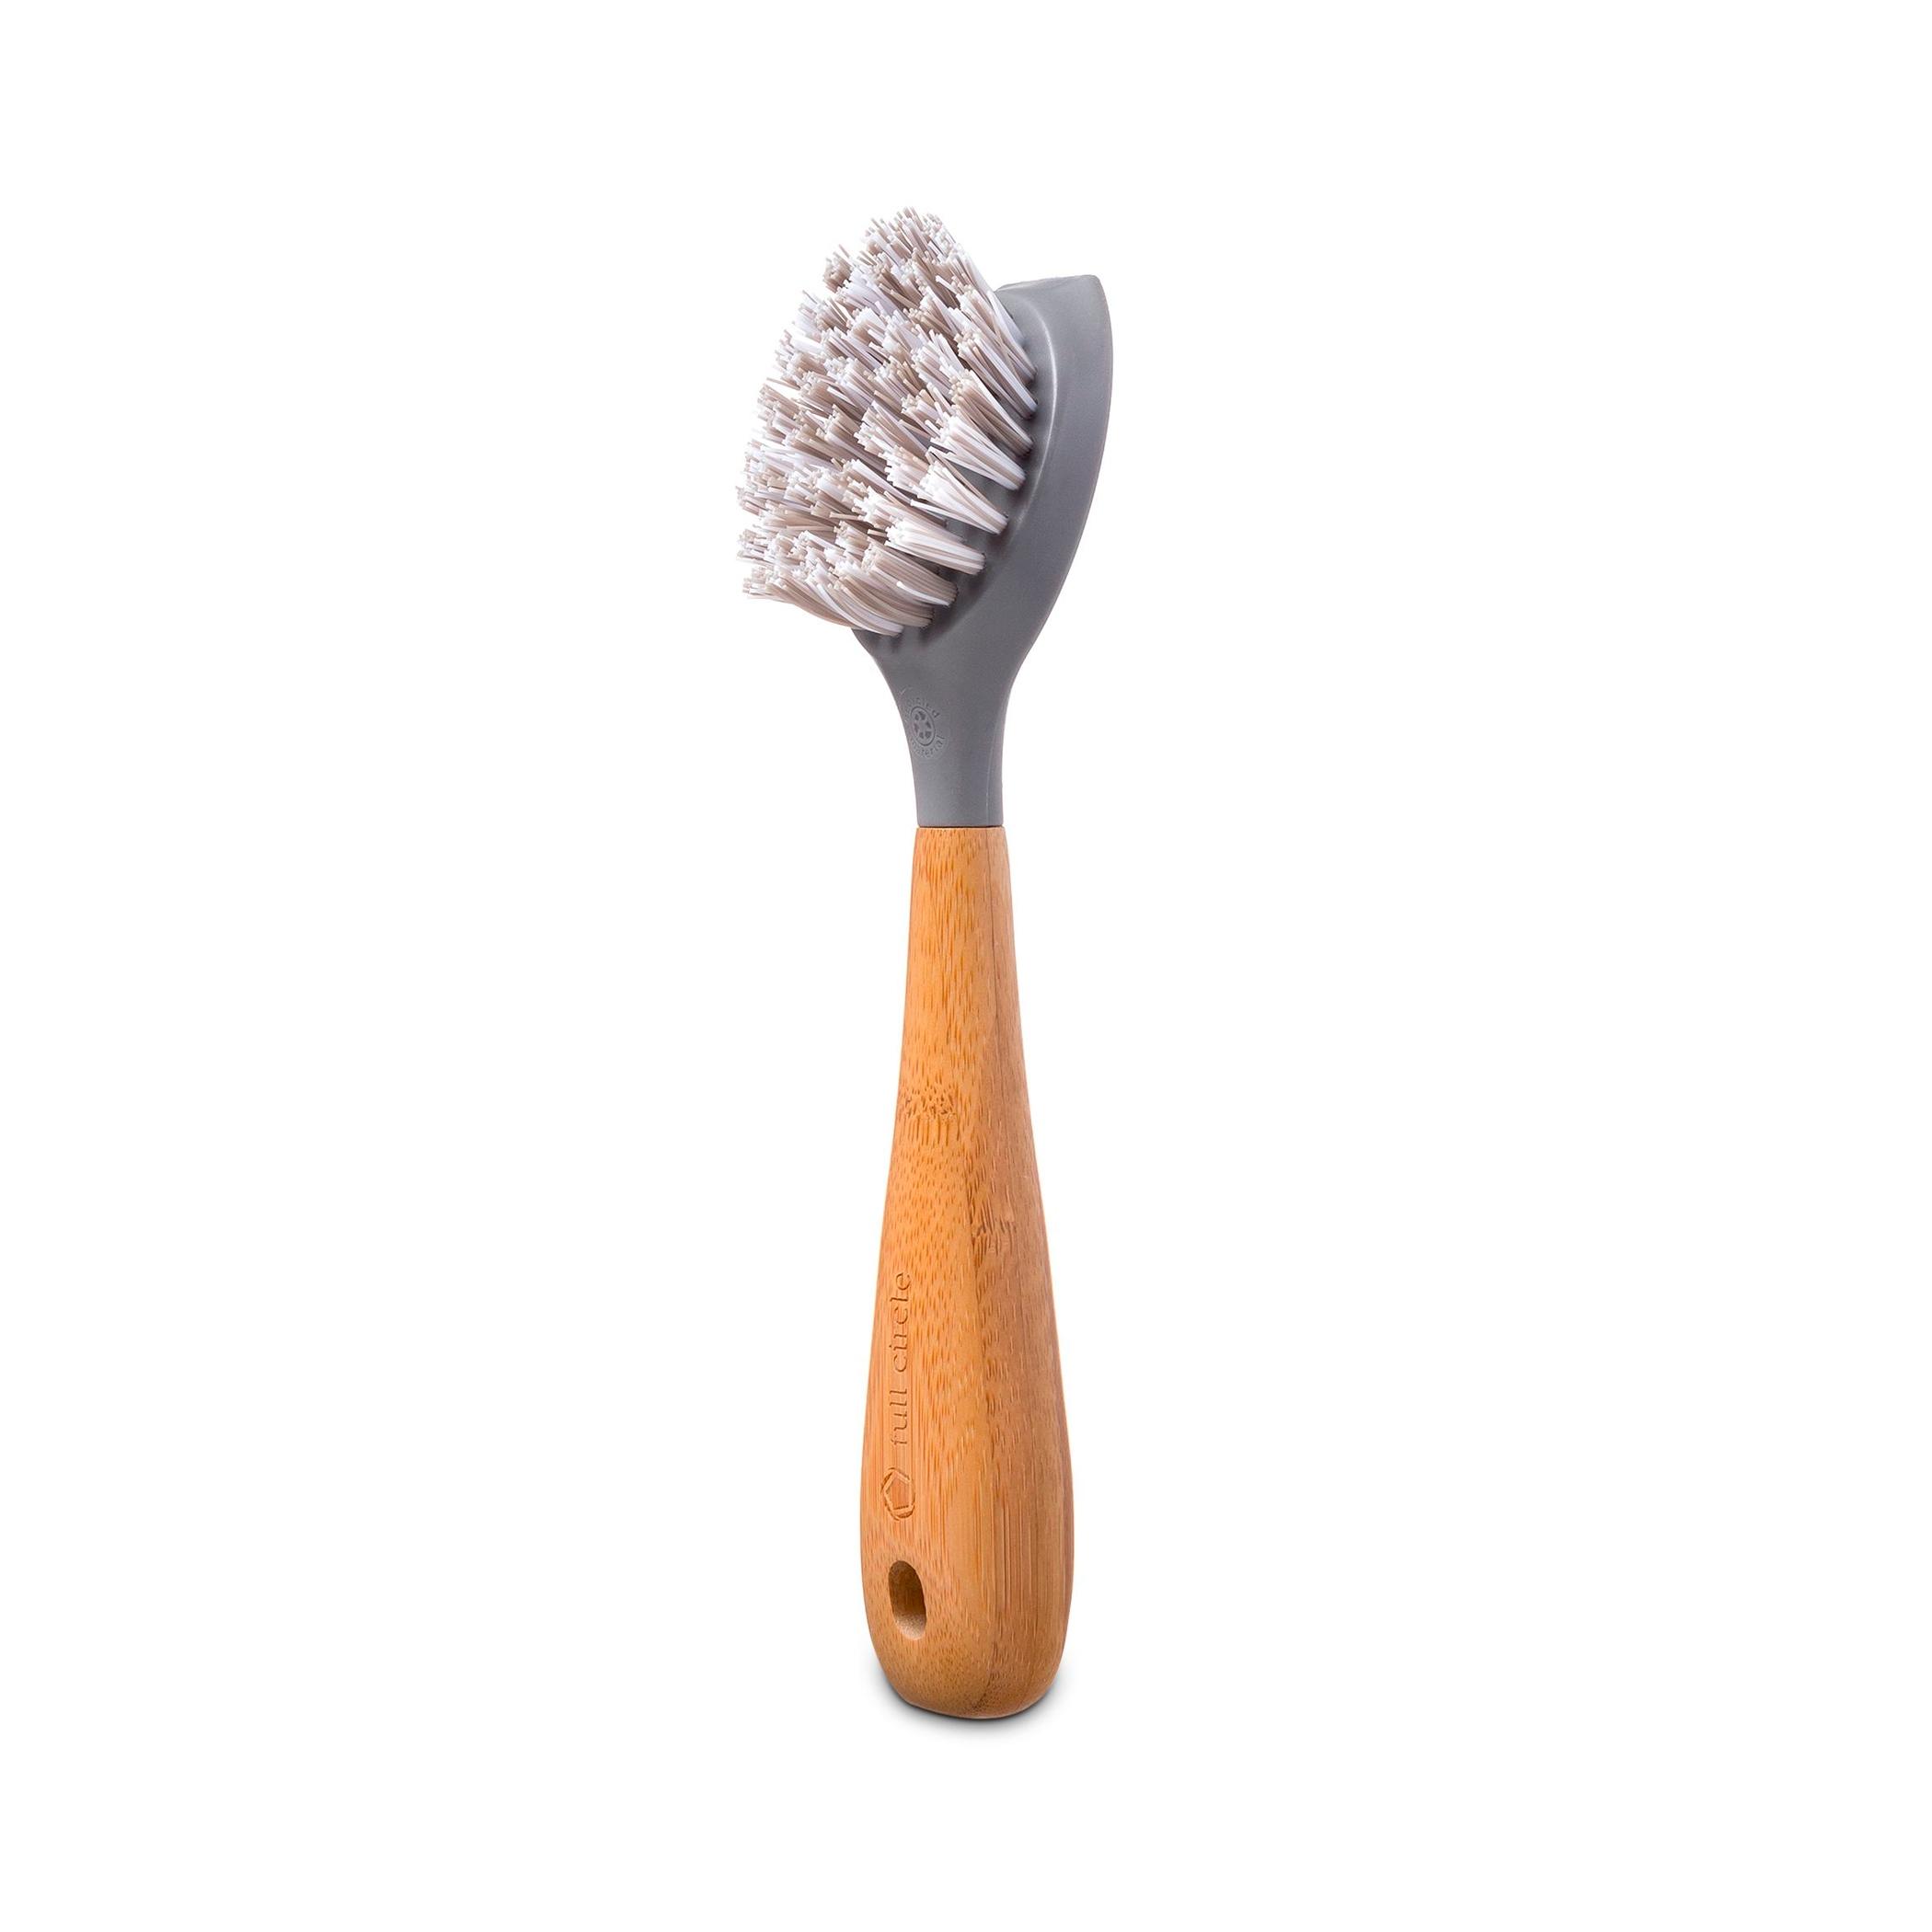 Full Circle Tenacious C Cast Iron Brush from Gimme the Good Stuff